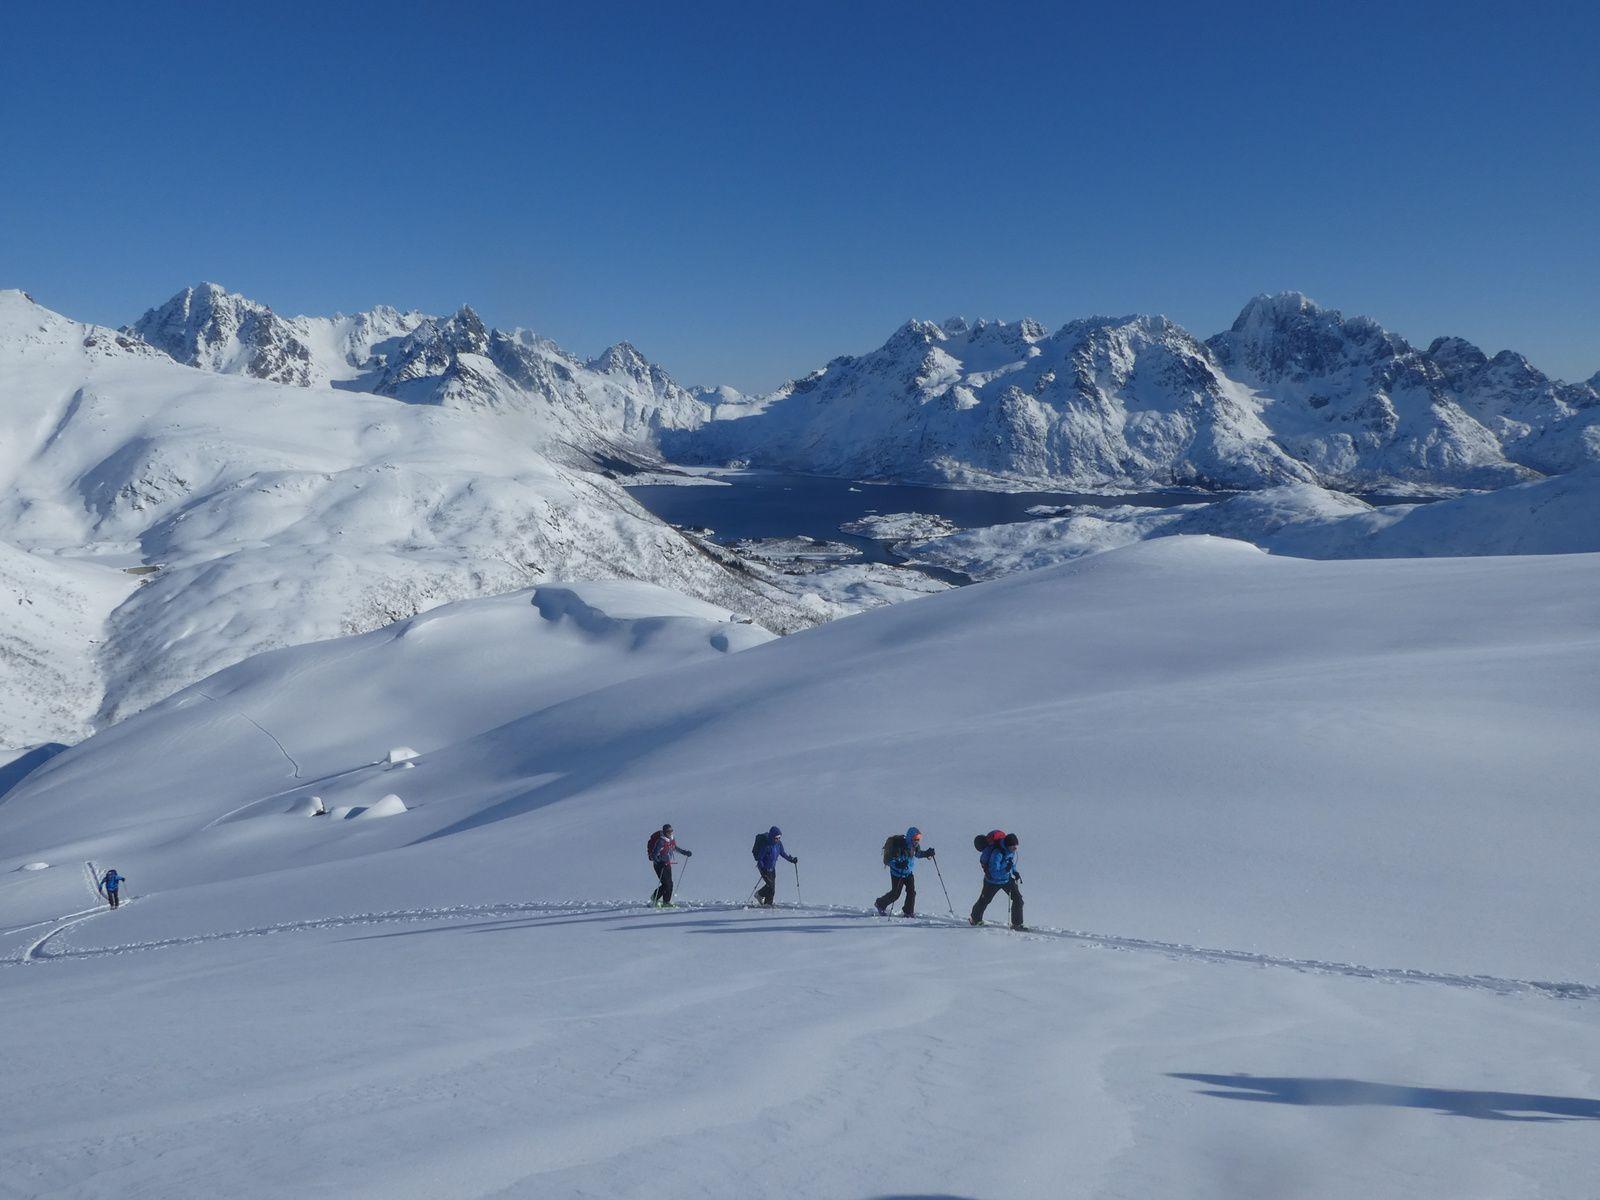 Vidéo : ski de randonnée aux Lofoten : Torskmannen - 755 m